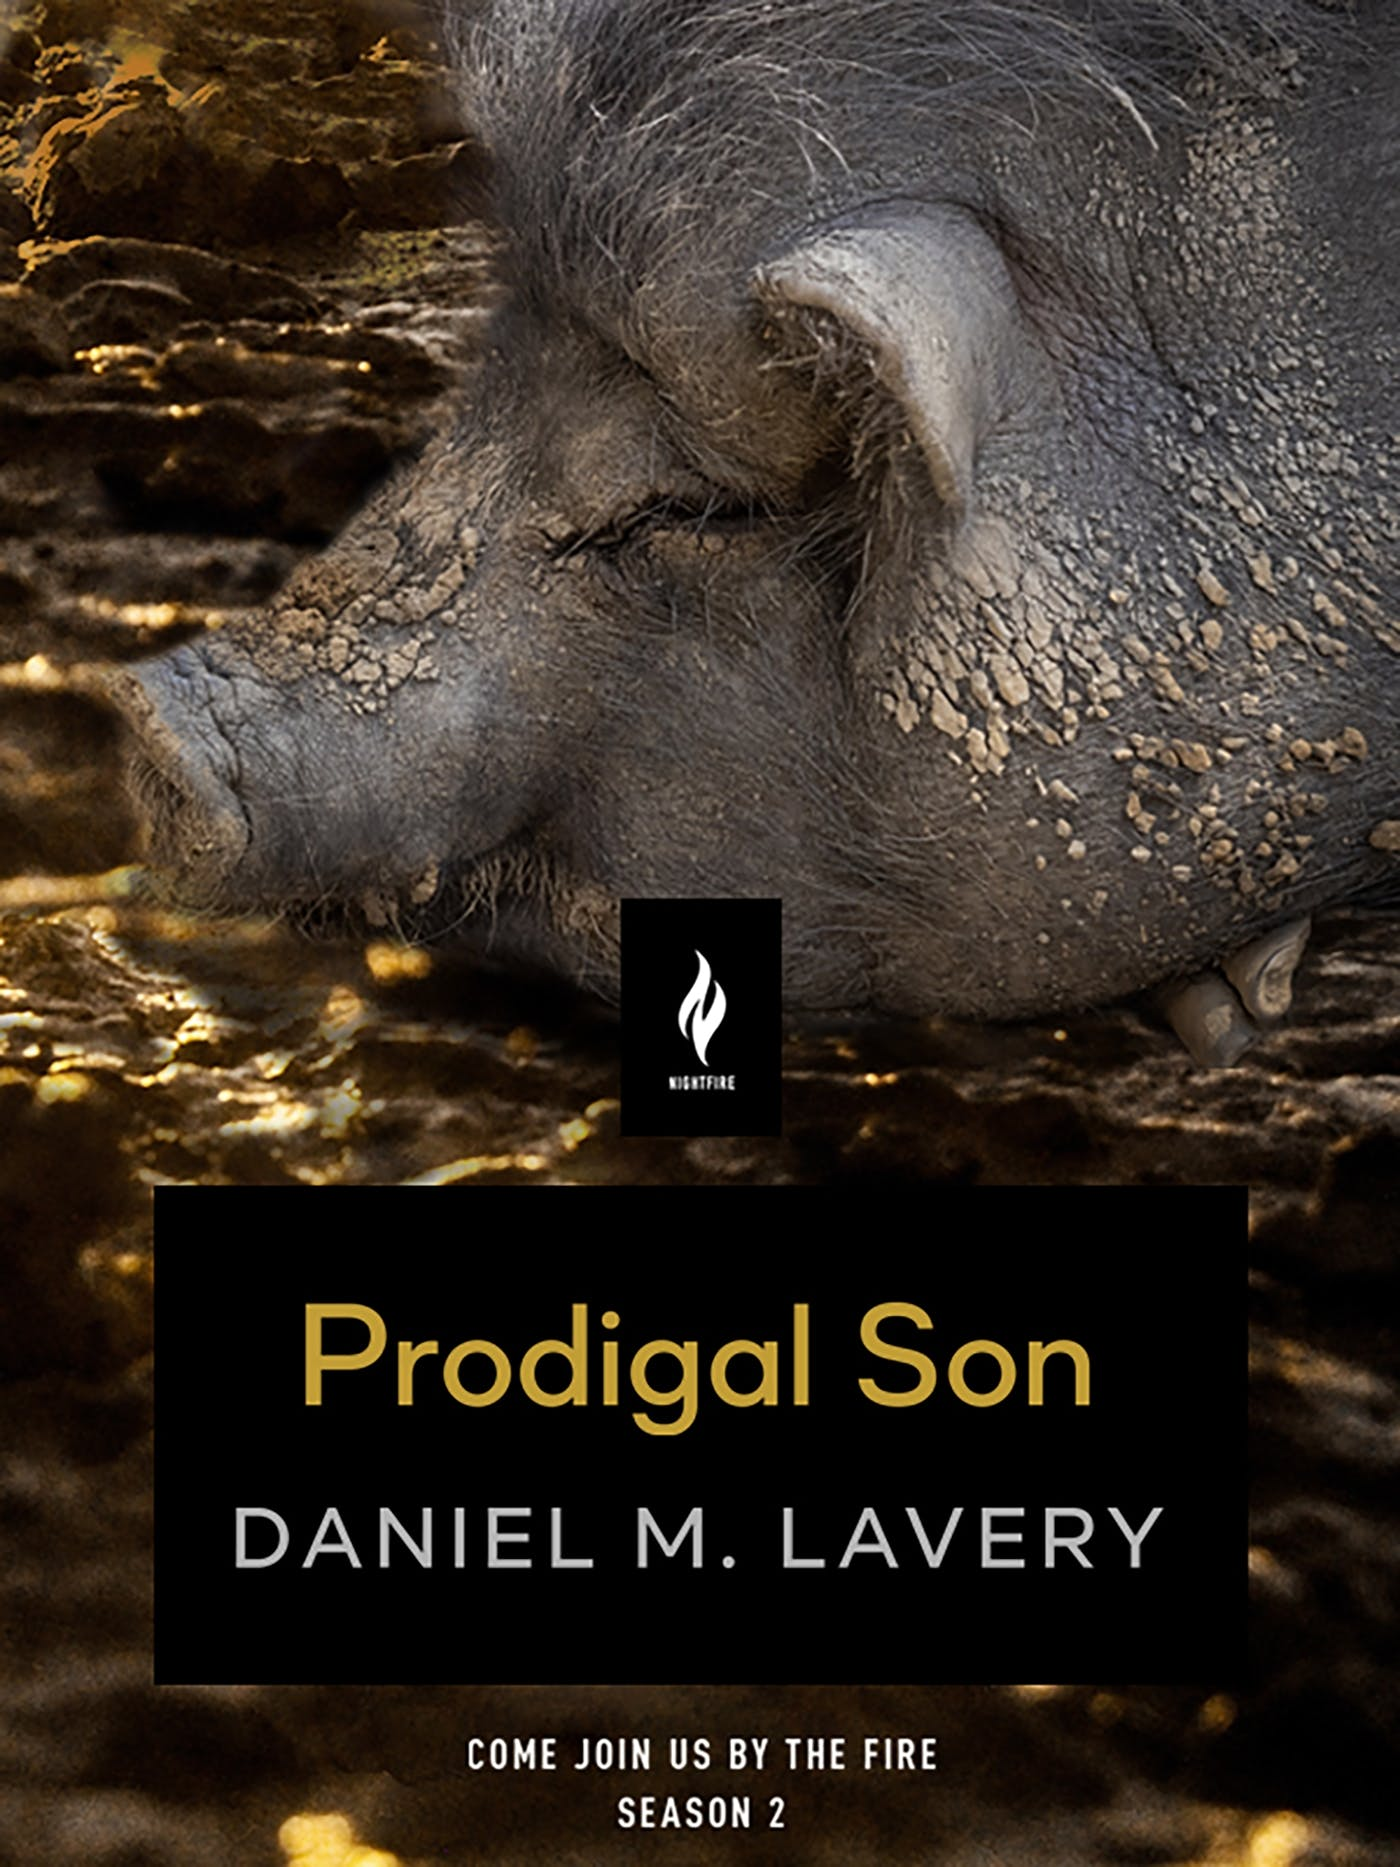 Image of Prodigal Son